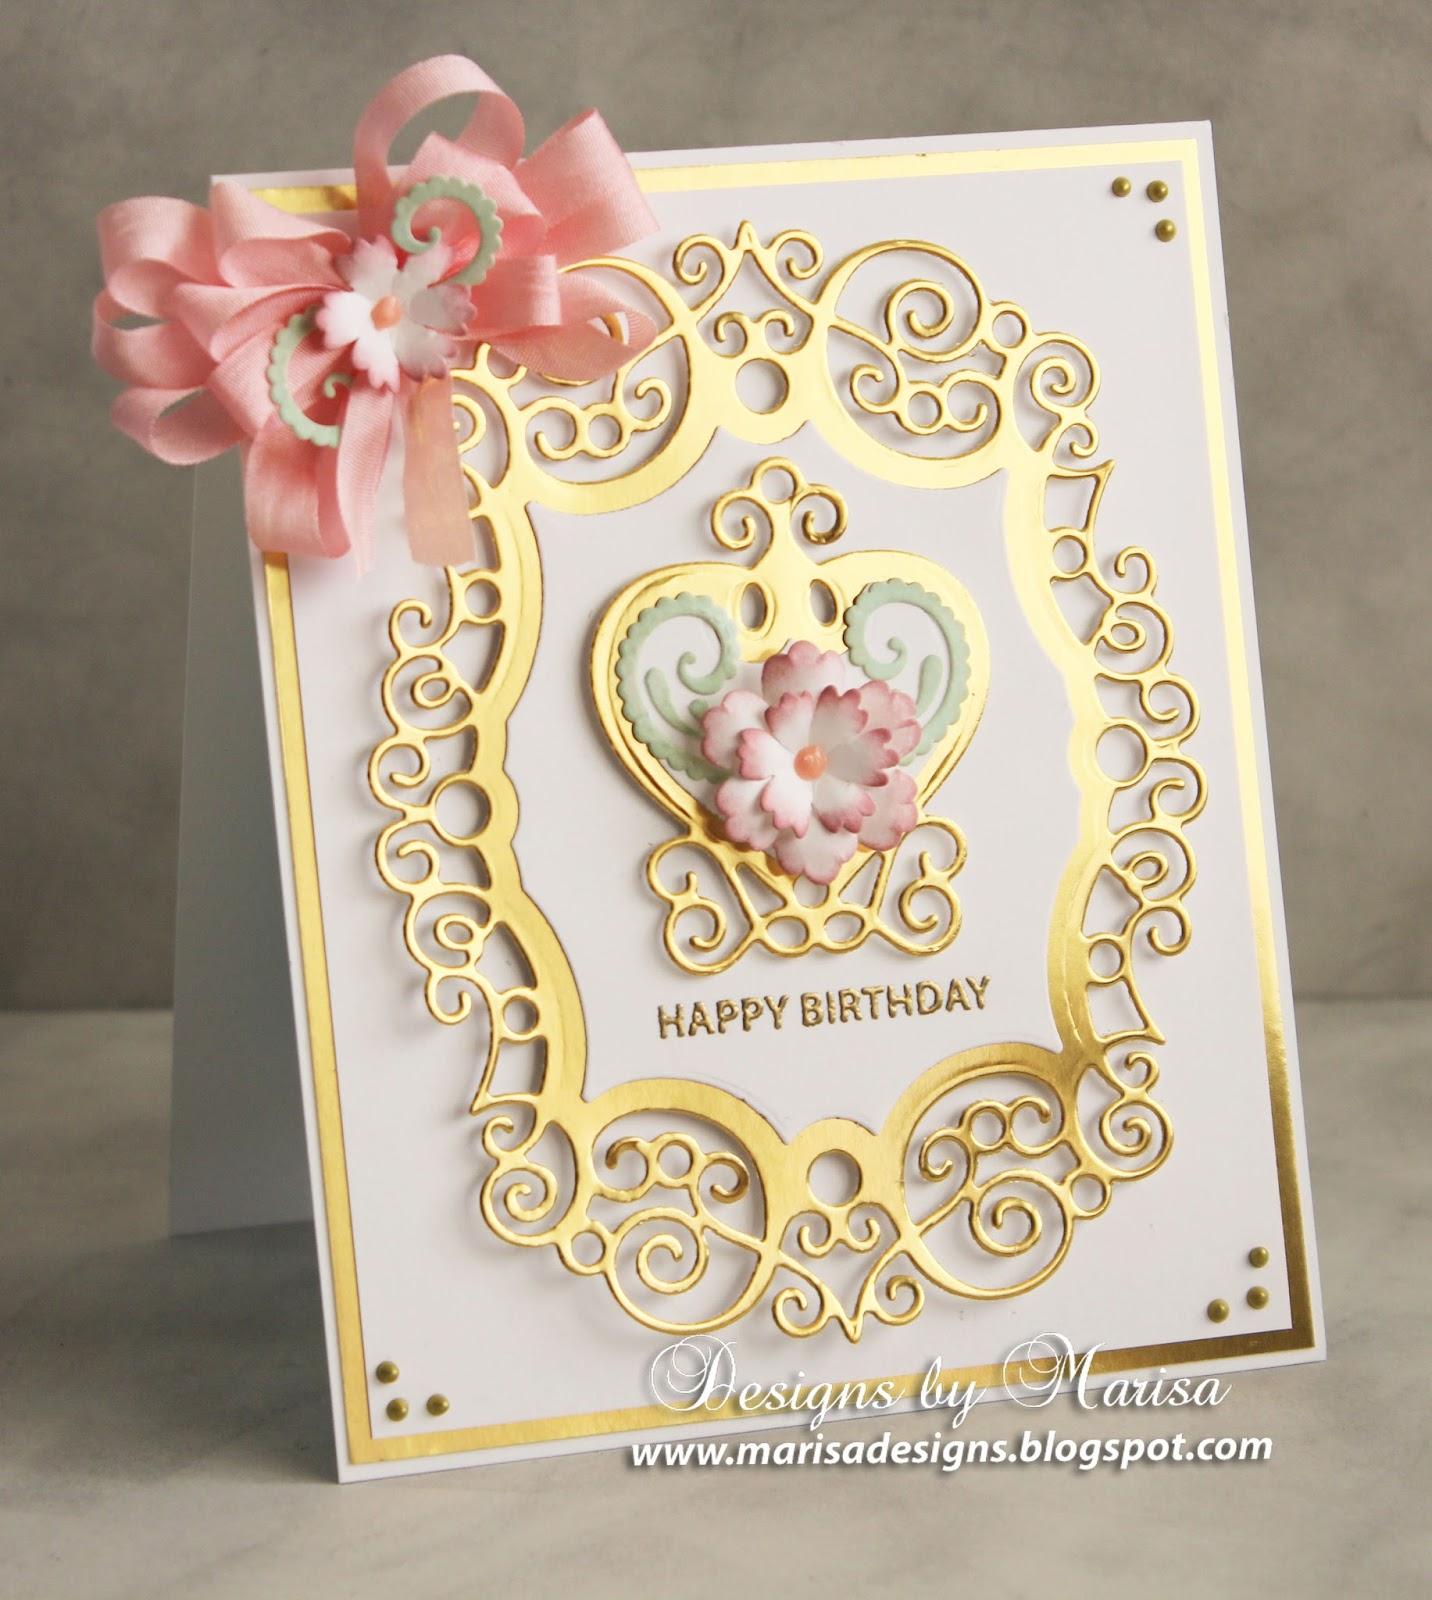 Designs by Marisa JustRite Papercraft Happy Birthday Card – Papercraft Birthday Card